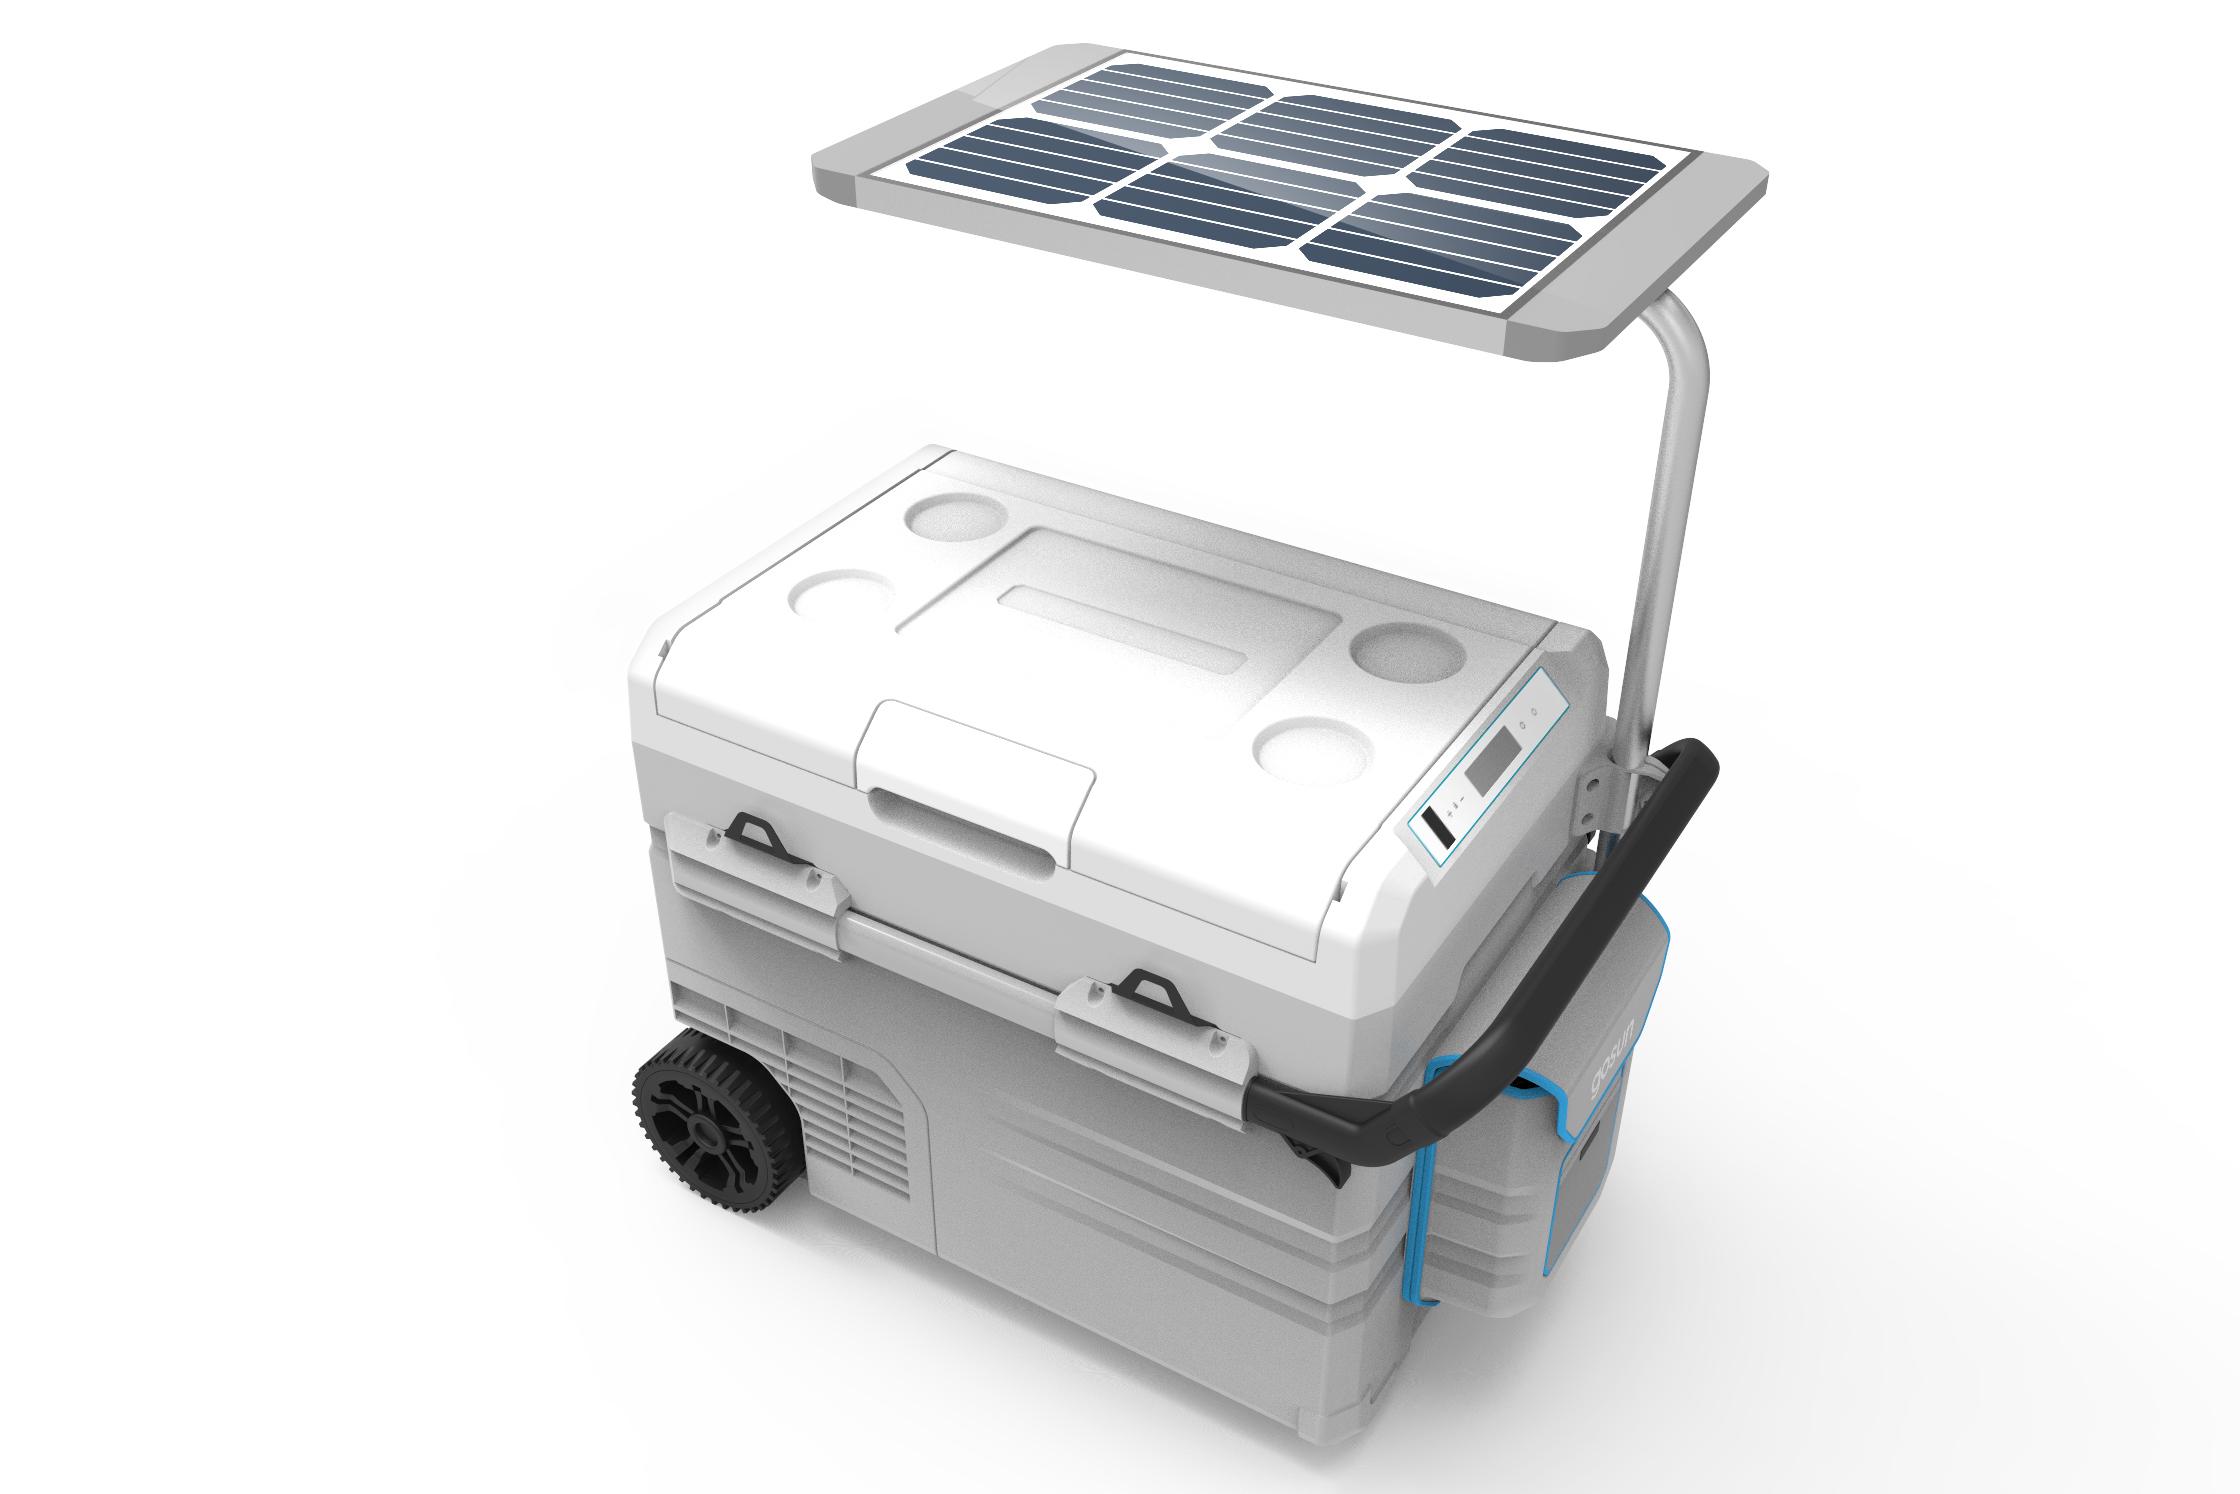 GoSun Chillest solar cooler